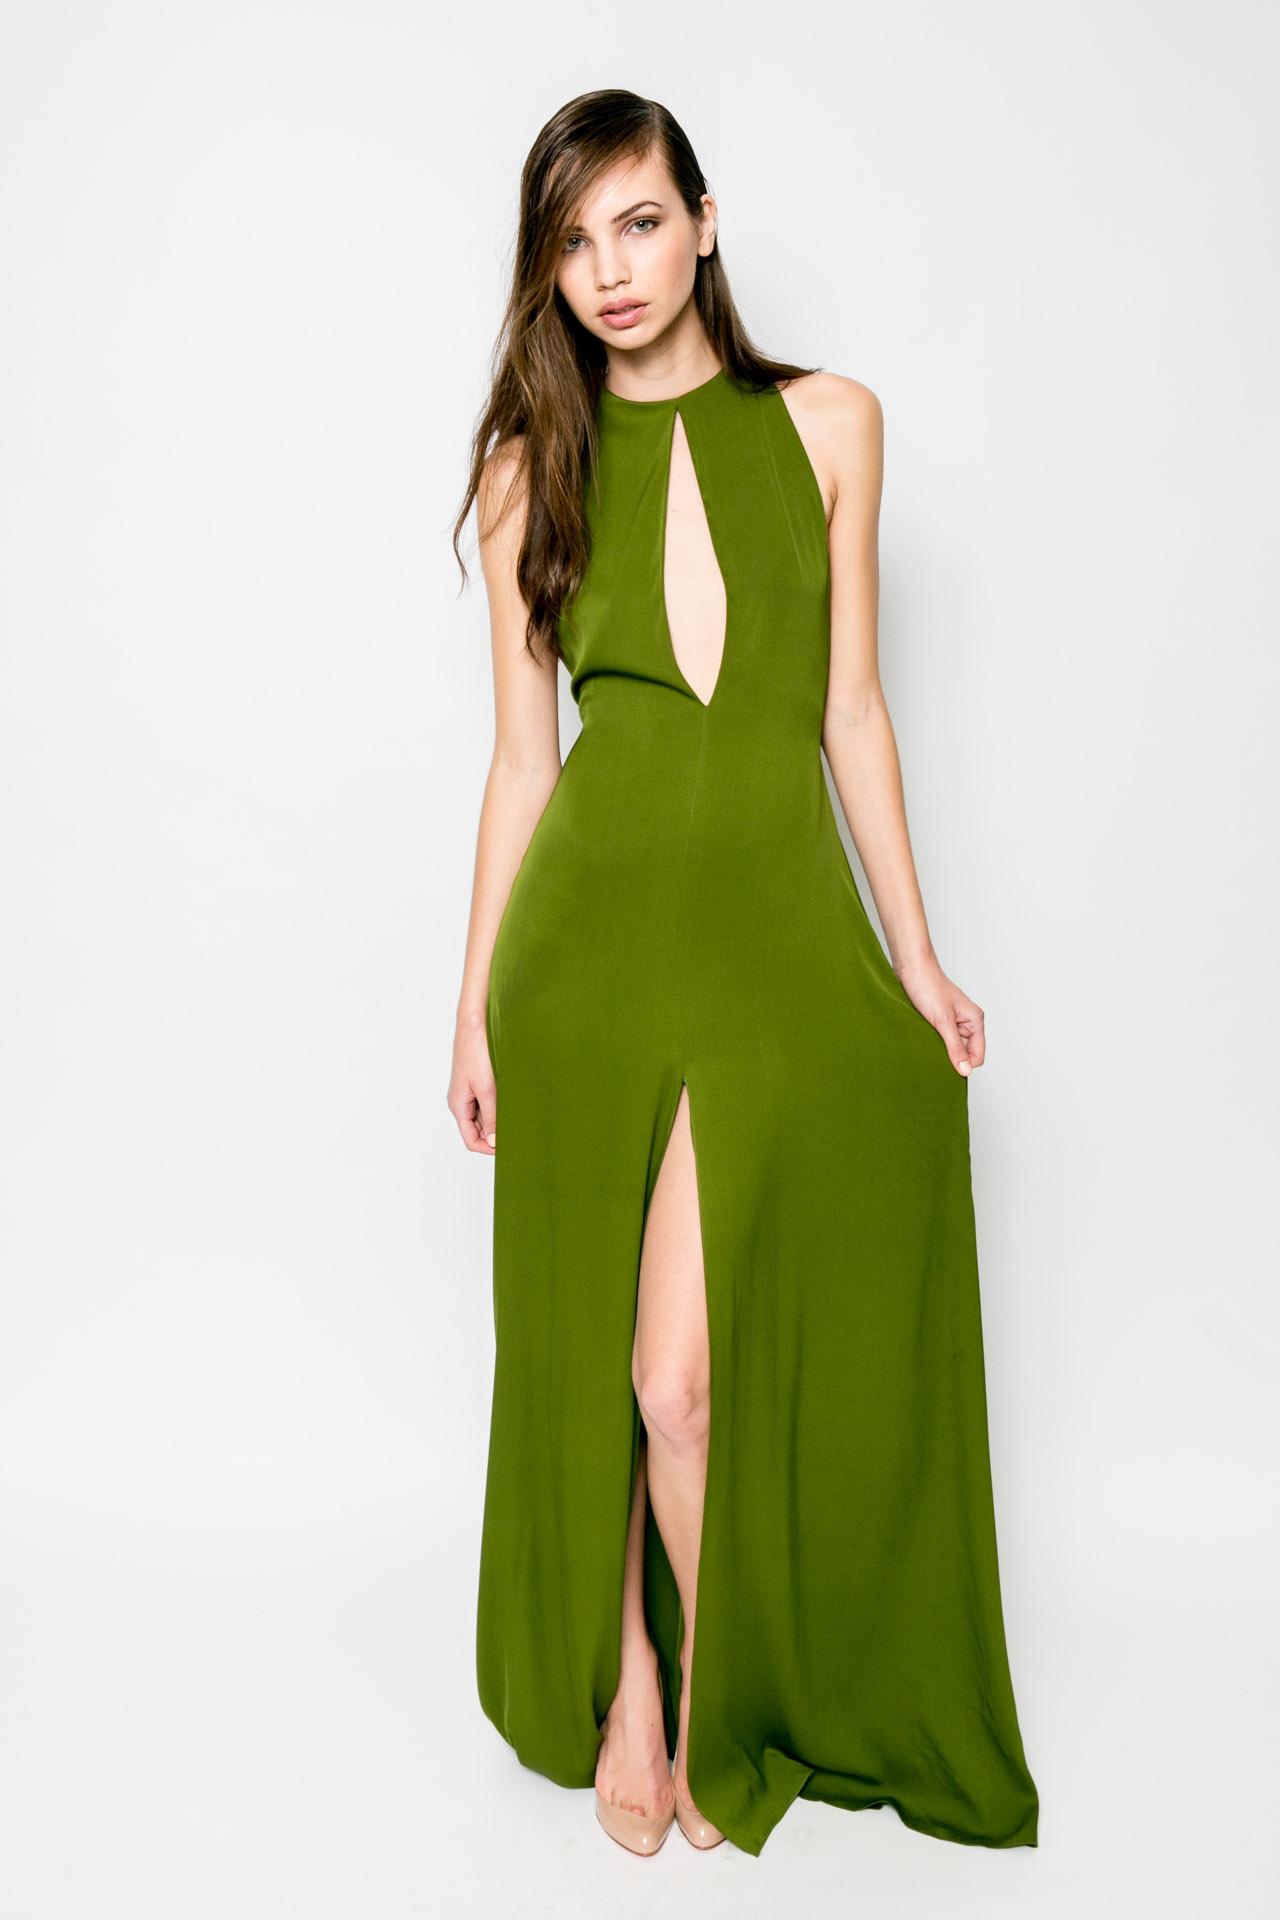 Prix de marie claire 2013 - Karl Capp dress